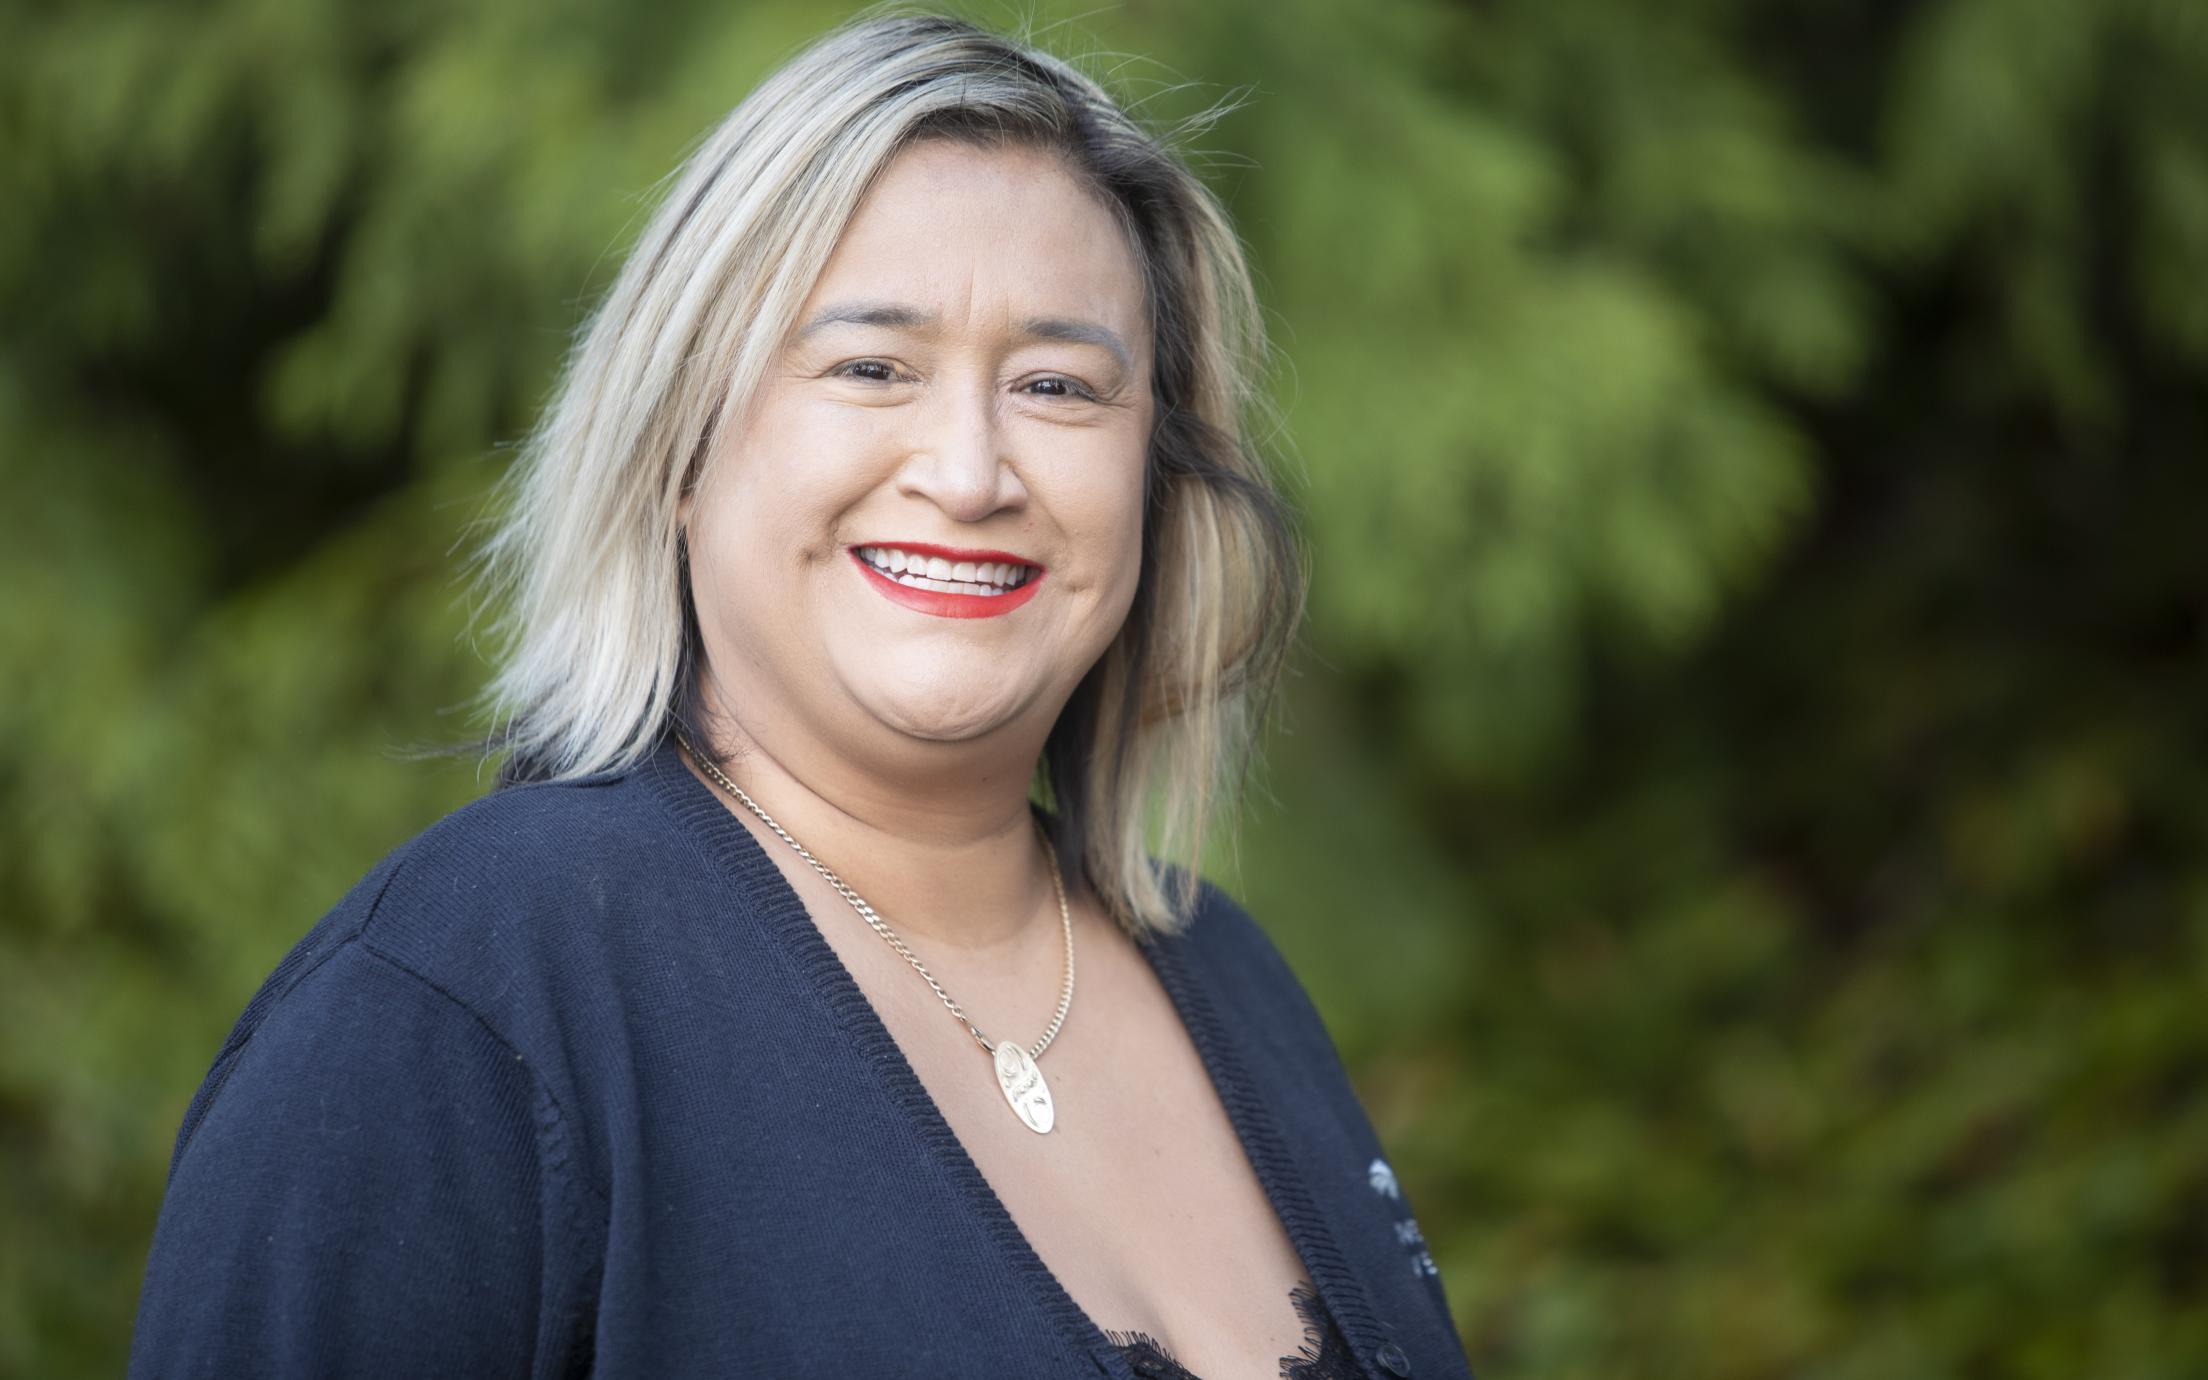 Sherry Mattice, VIU Alumna and VIU Indigenous Education Navigator